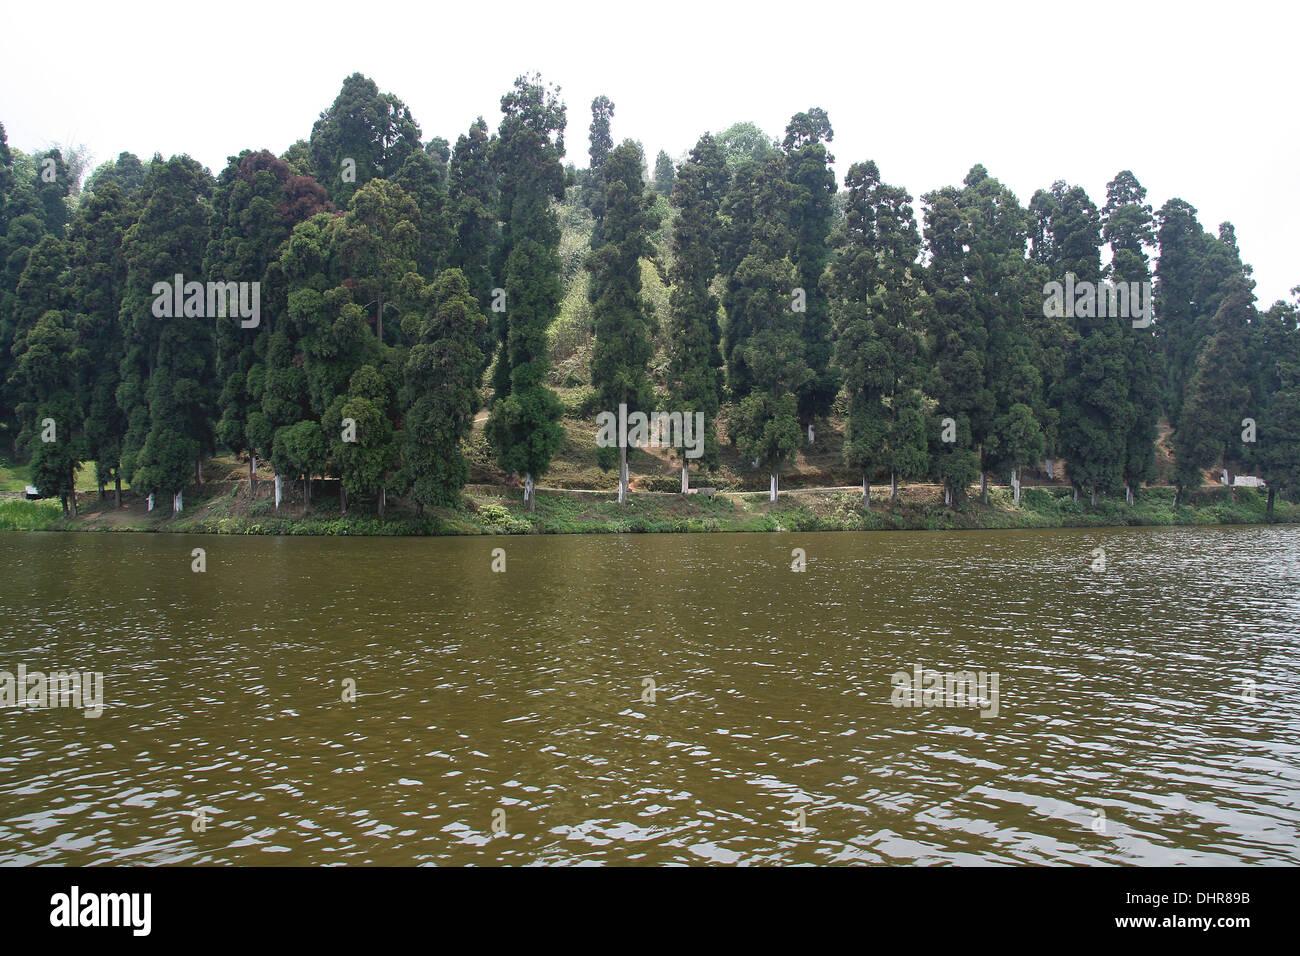 Pine trees standing aloft on bank of lake - Stock Image